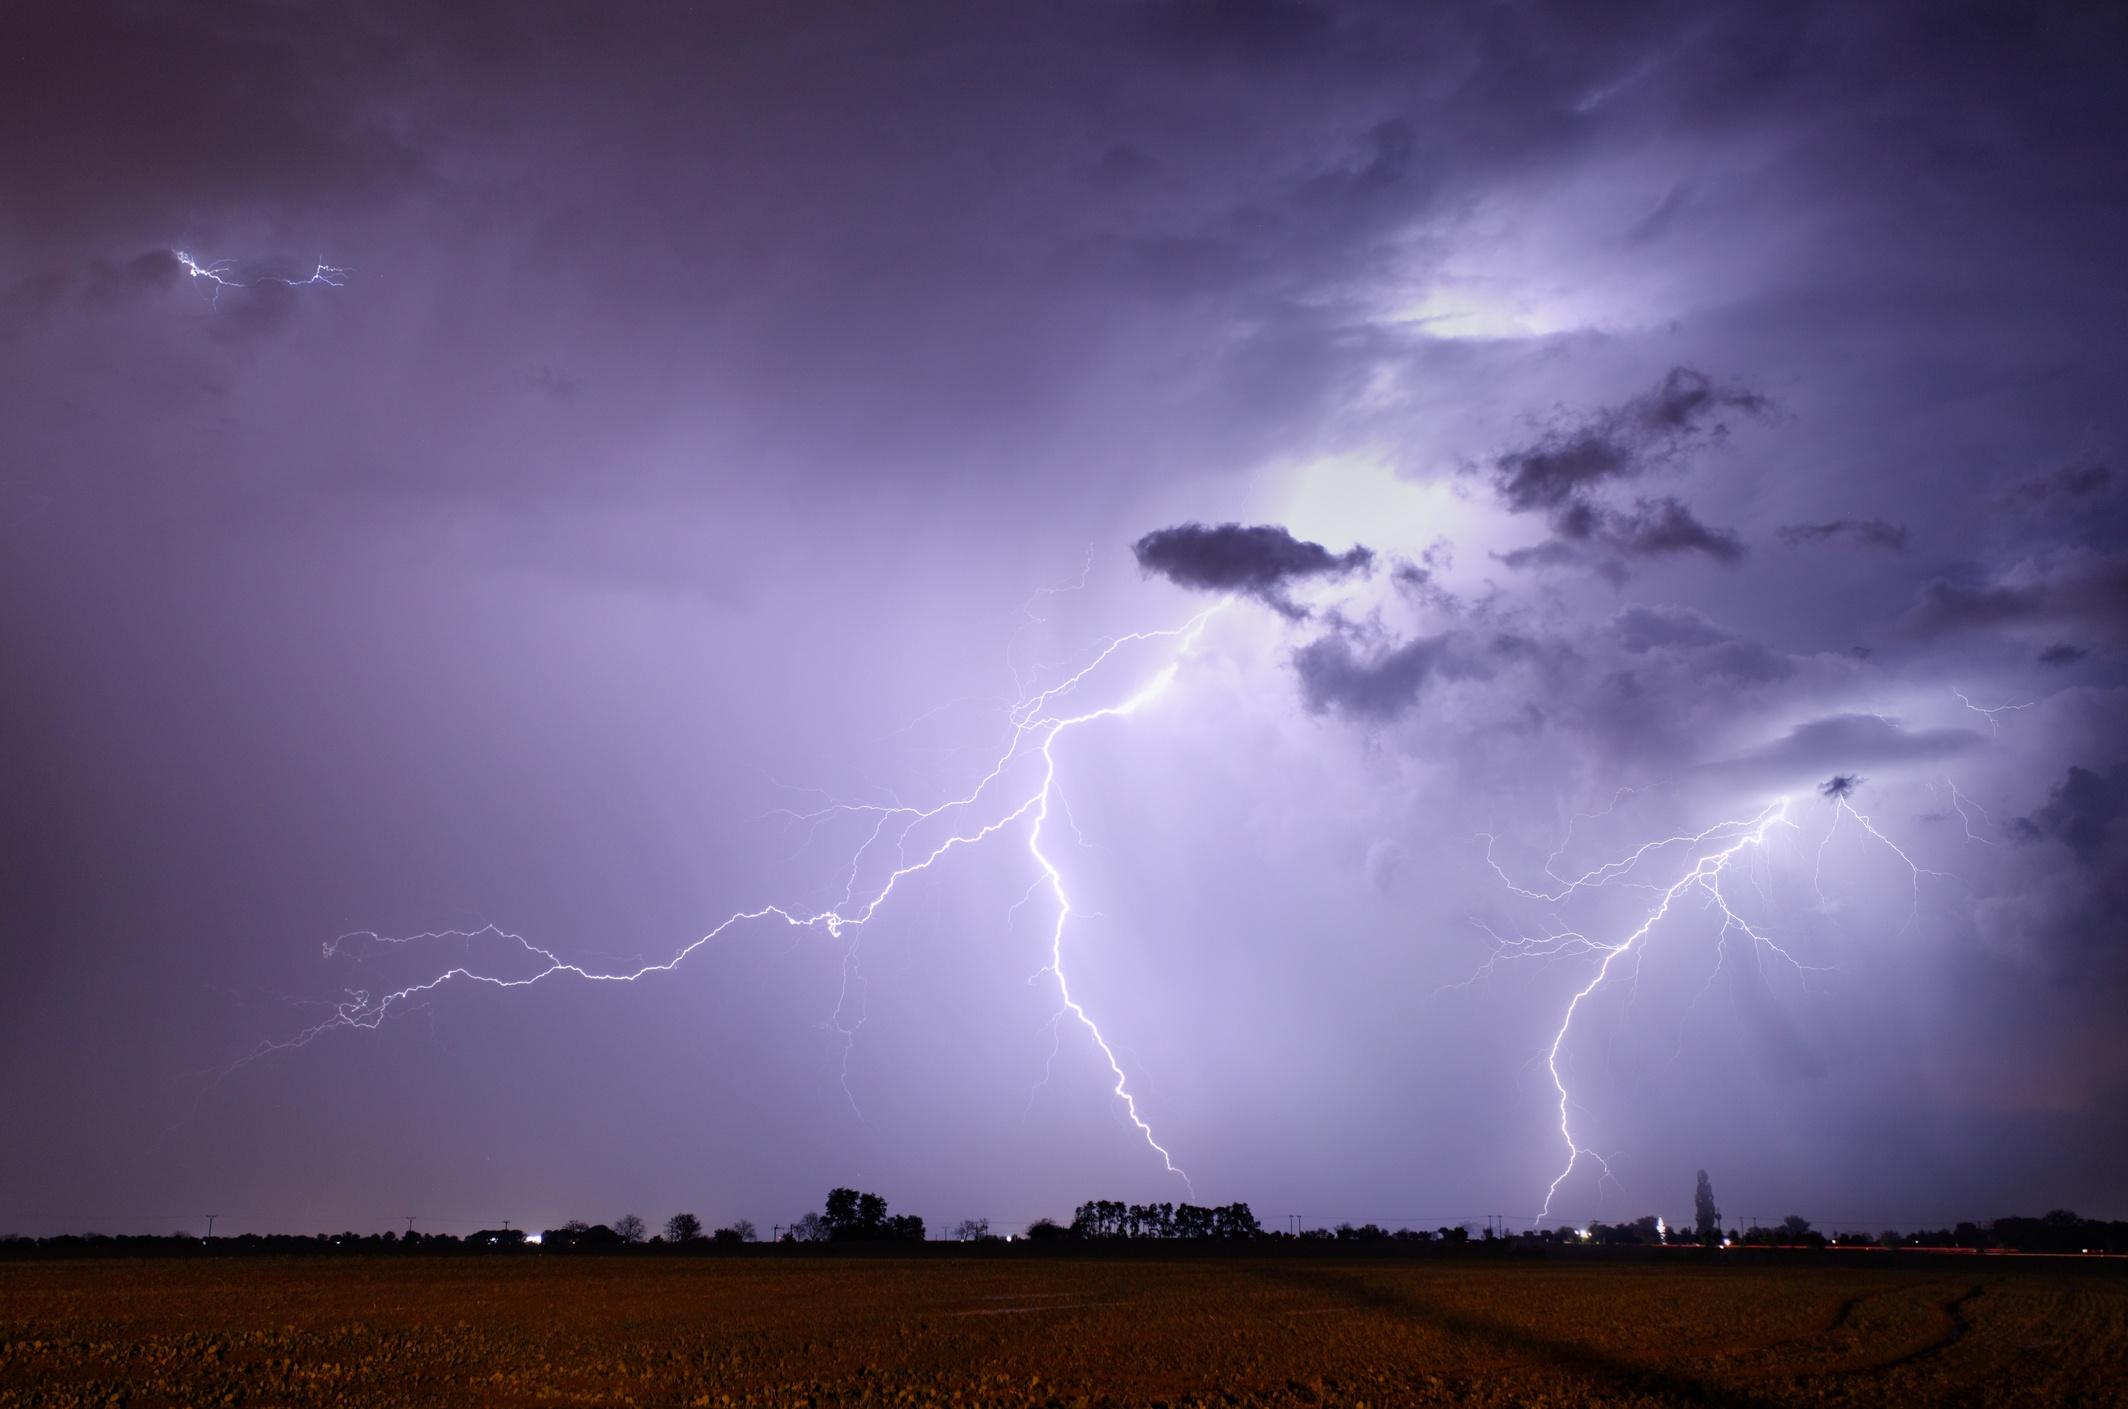 Lightning & Severe Weather